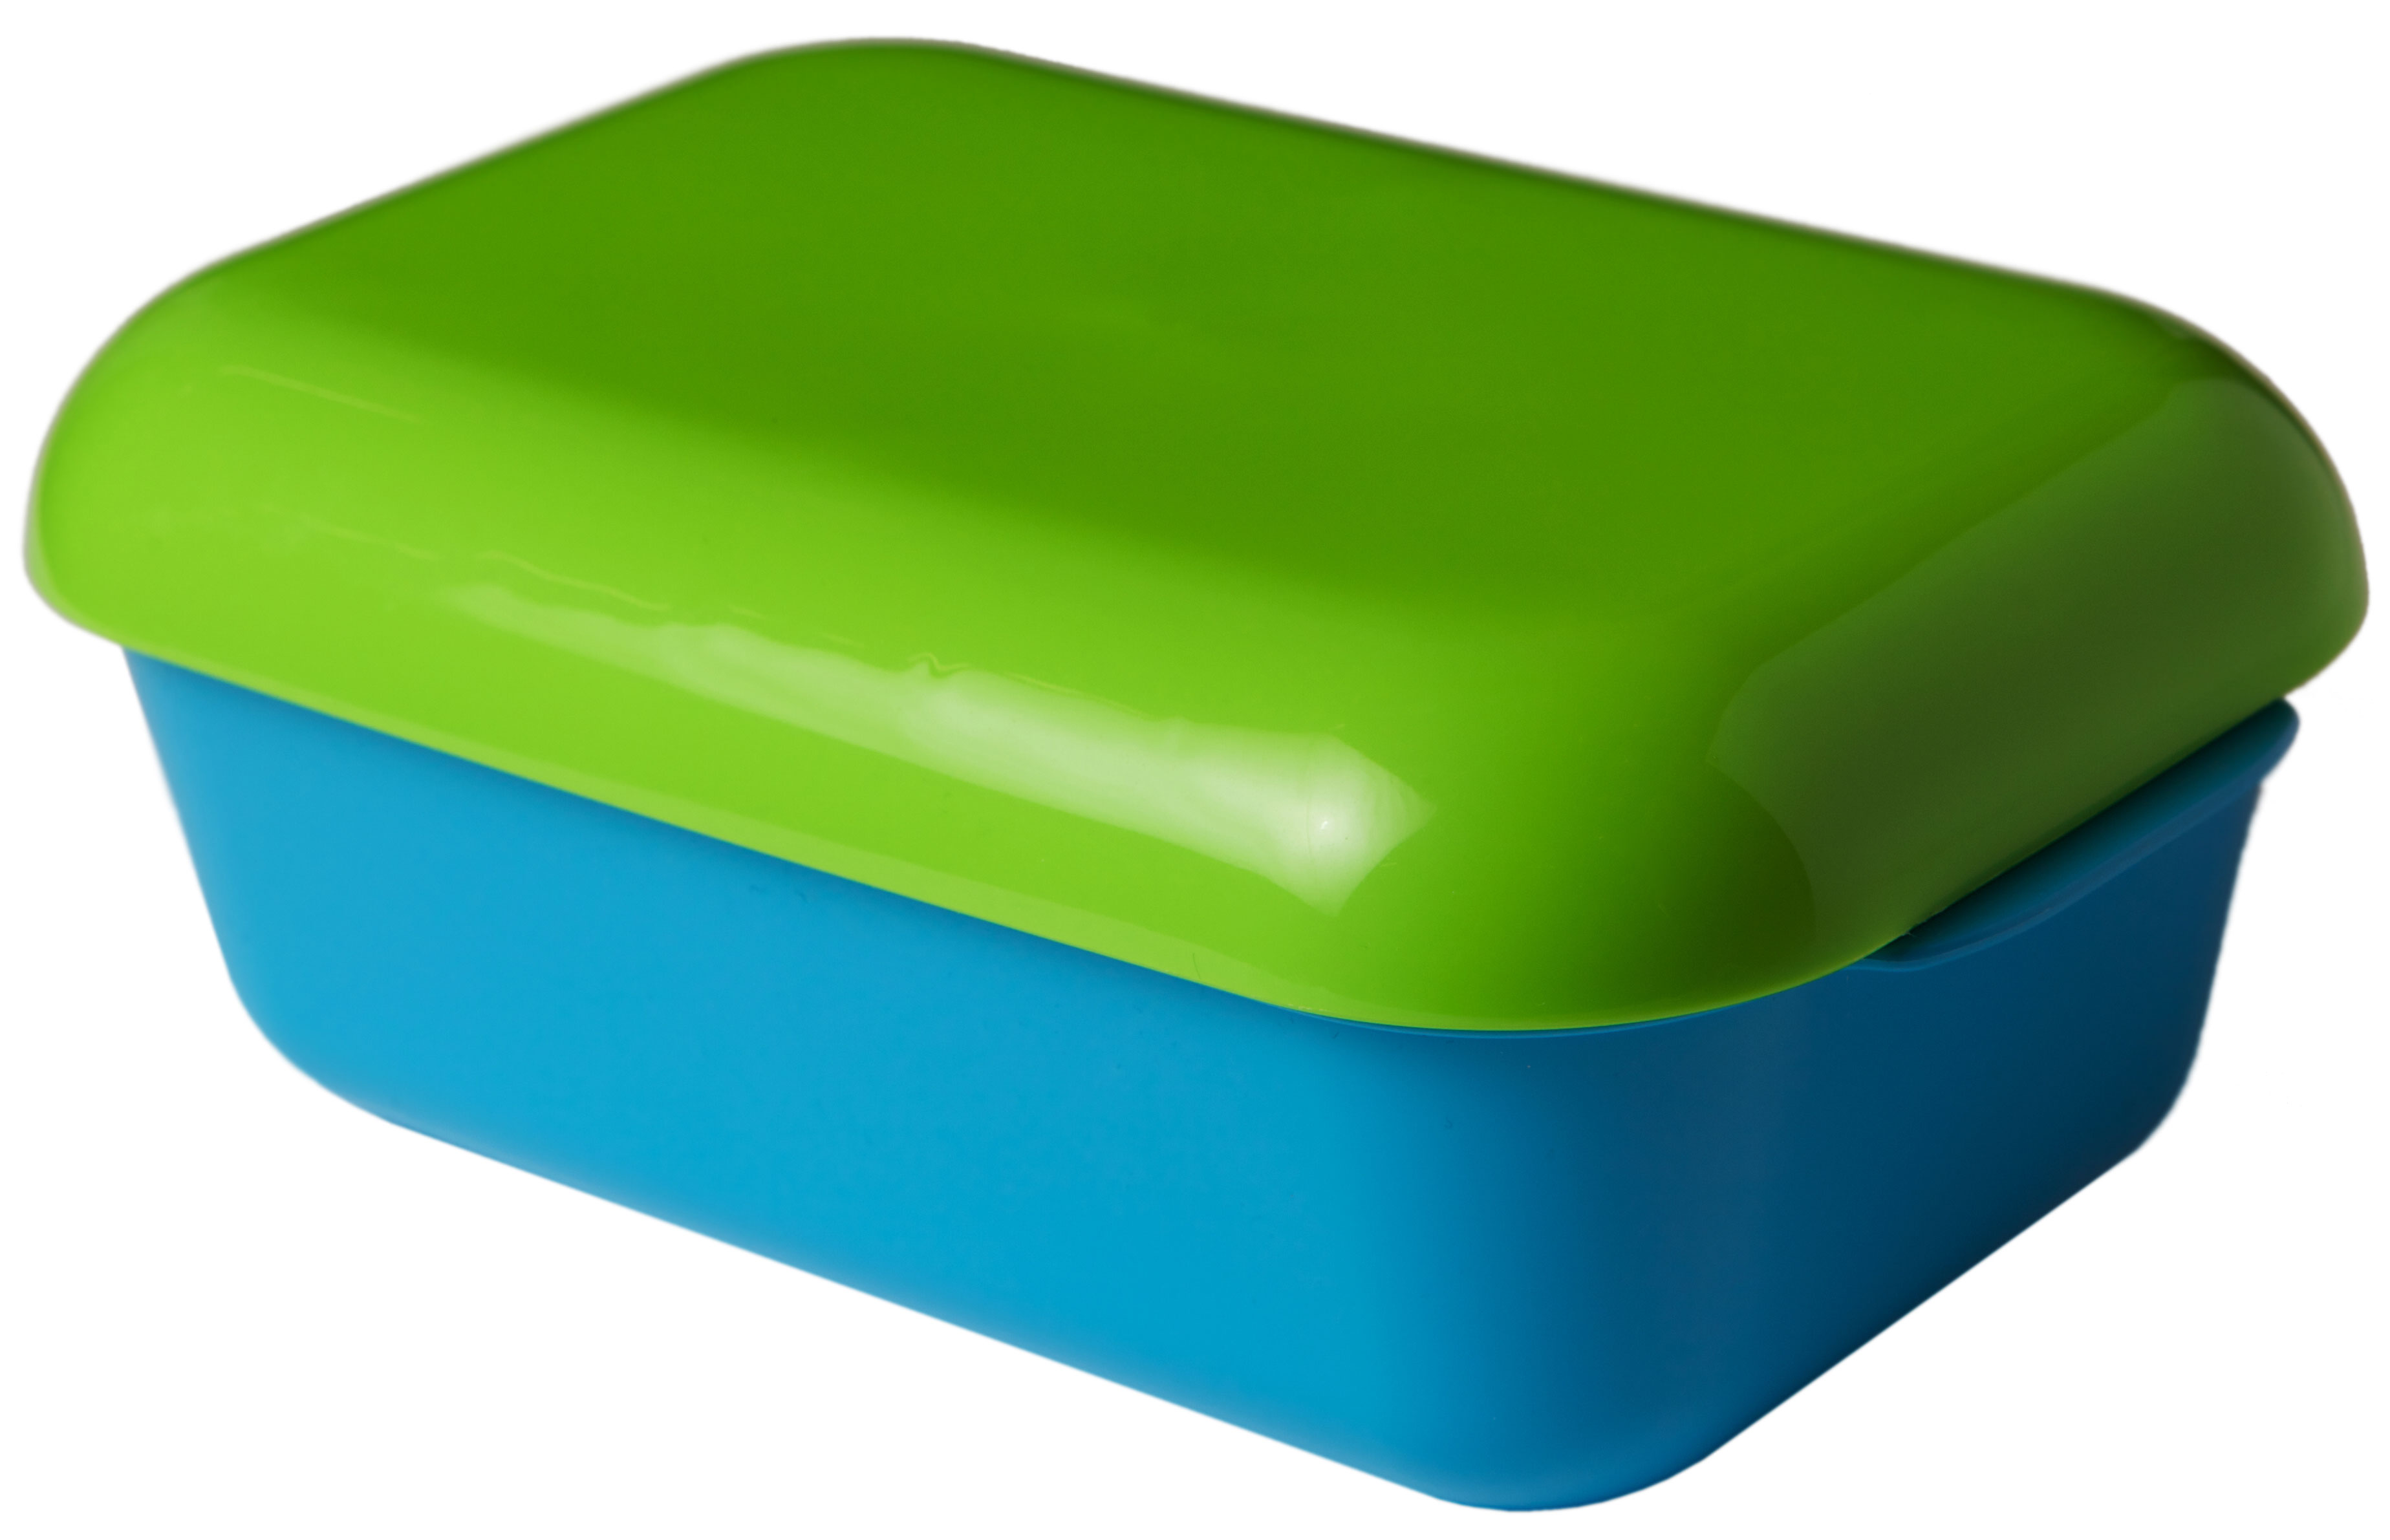 Frozzypack Kylmatlåda Summer Edition turquoise Green